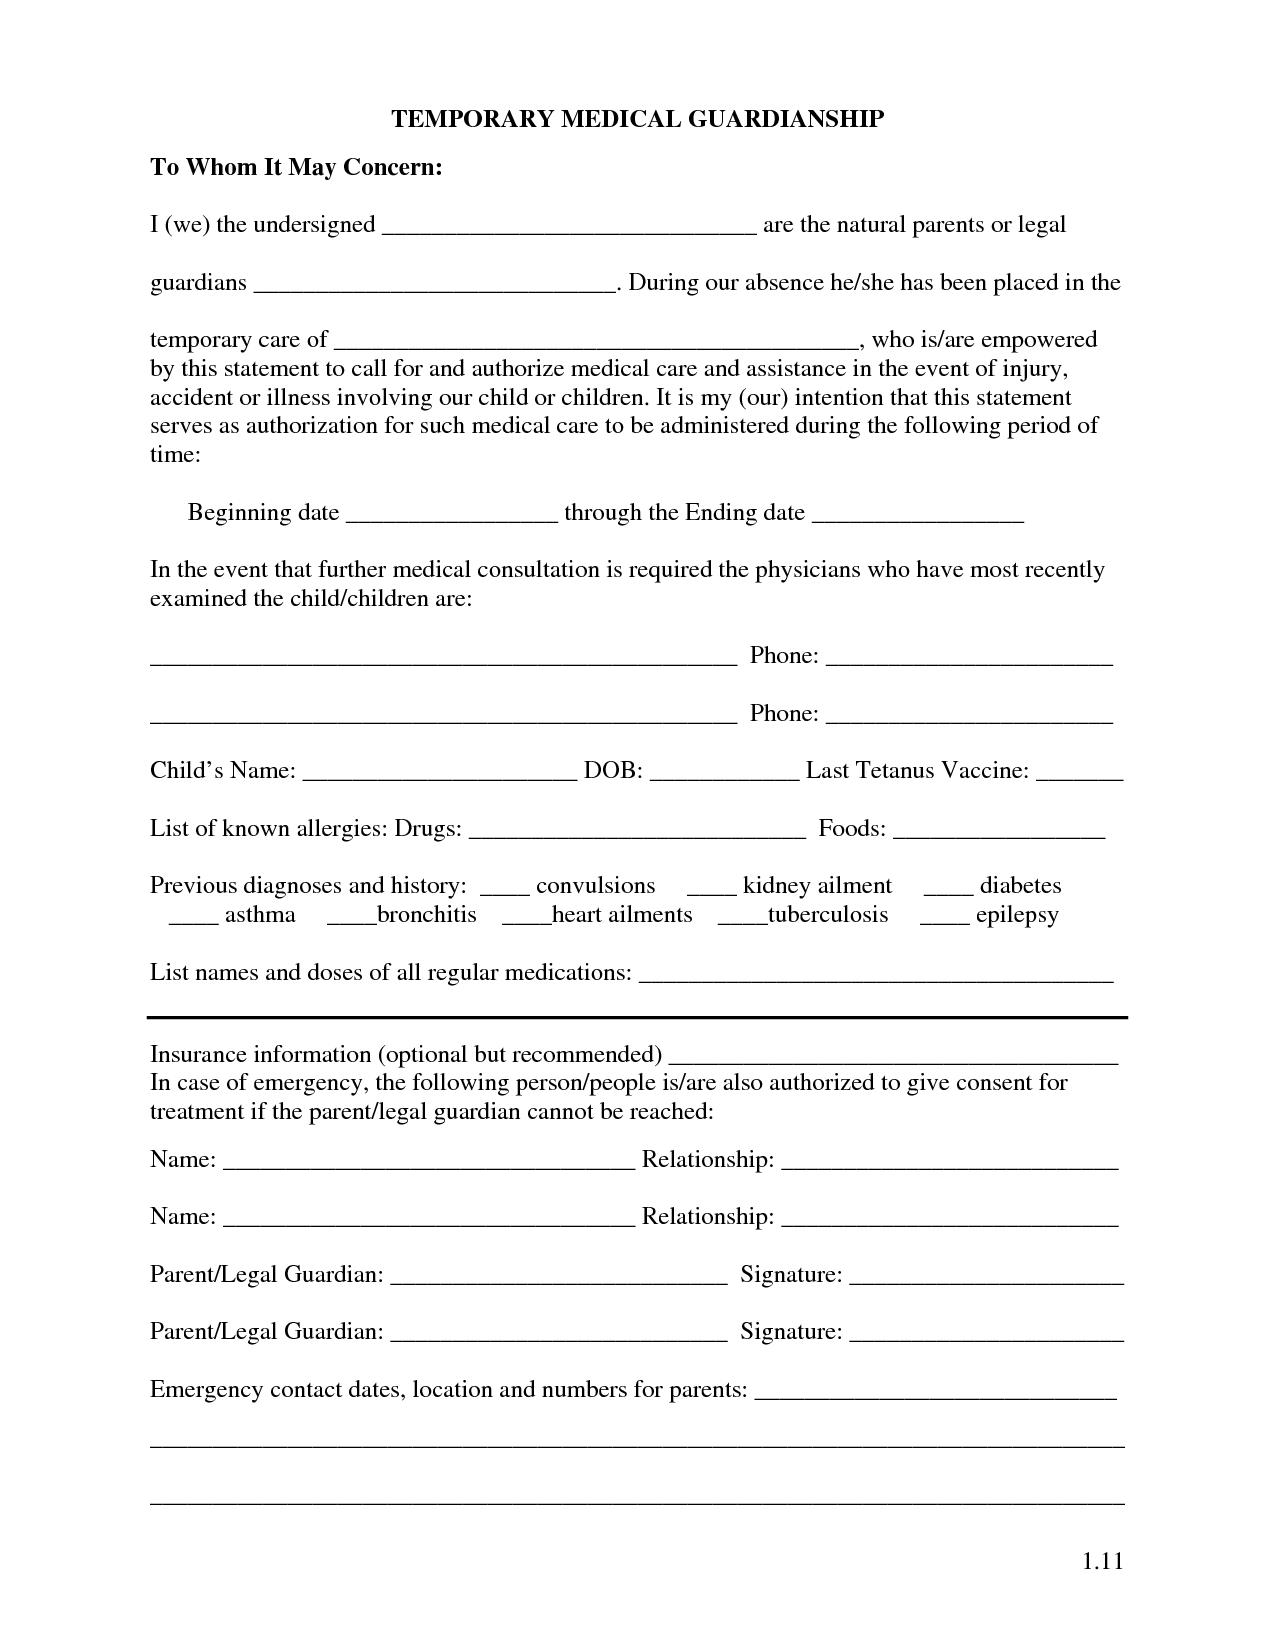 Free Printable Temporary Guardianship Forms   Forms   Child Custody - Free Printable Child Custody Papers